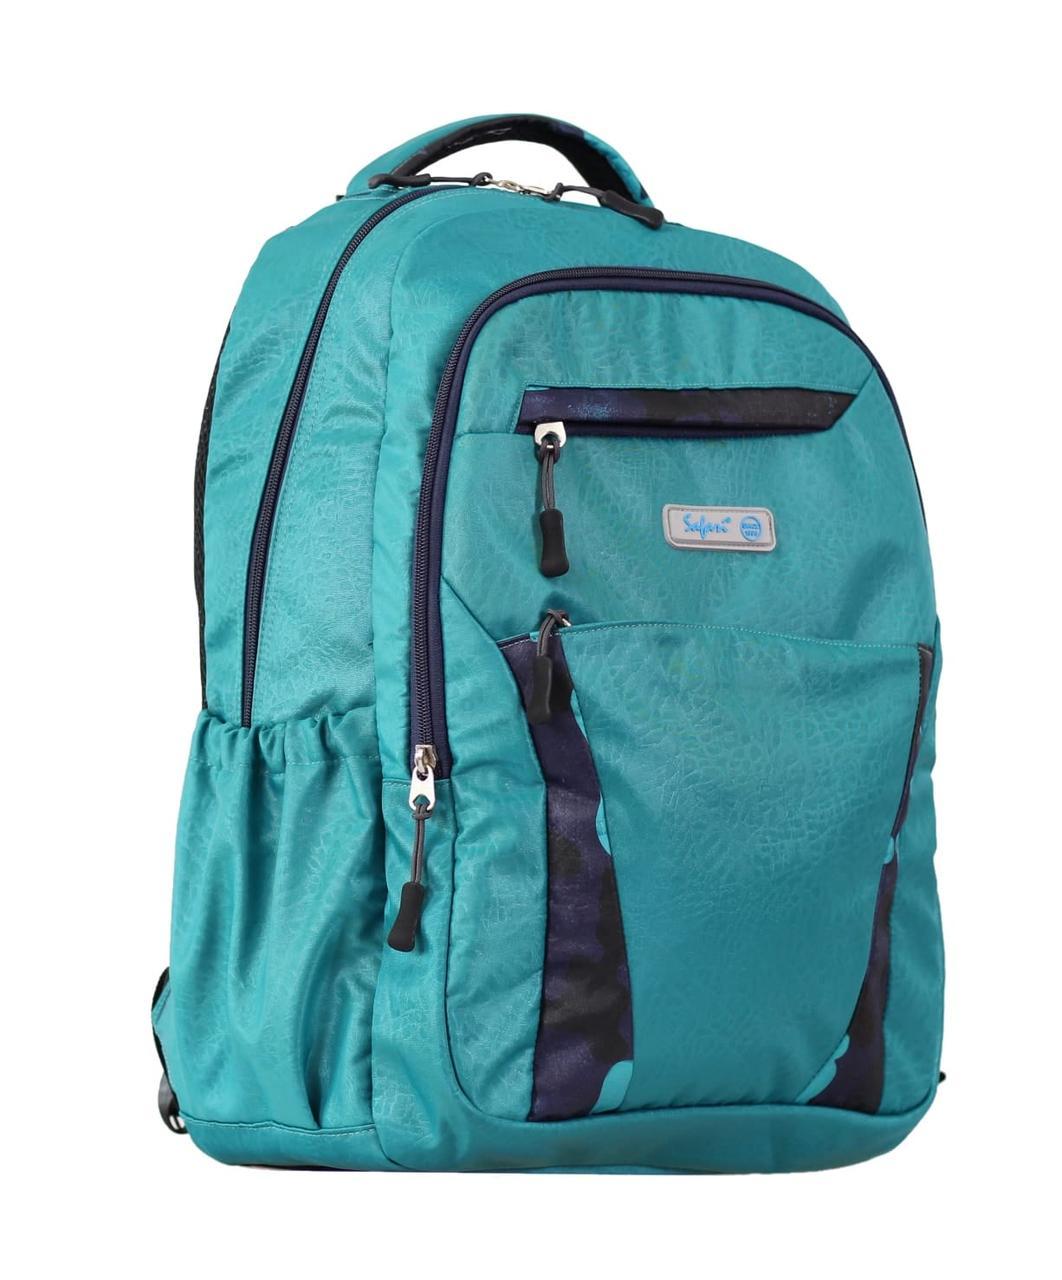 Рюкзак 3 отд 45*29*22 см 900D PL SAFARI Trend 1842